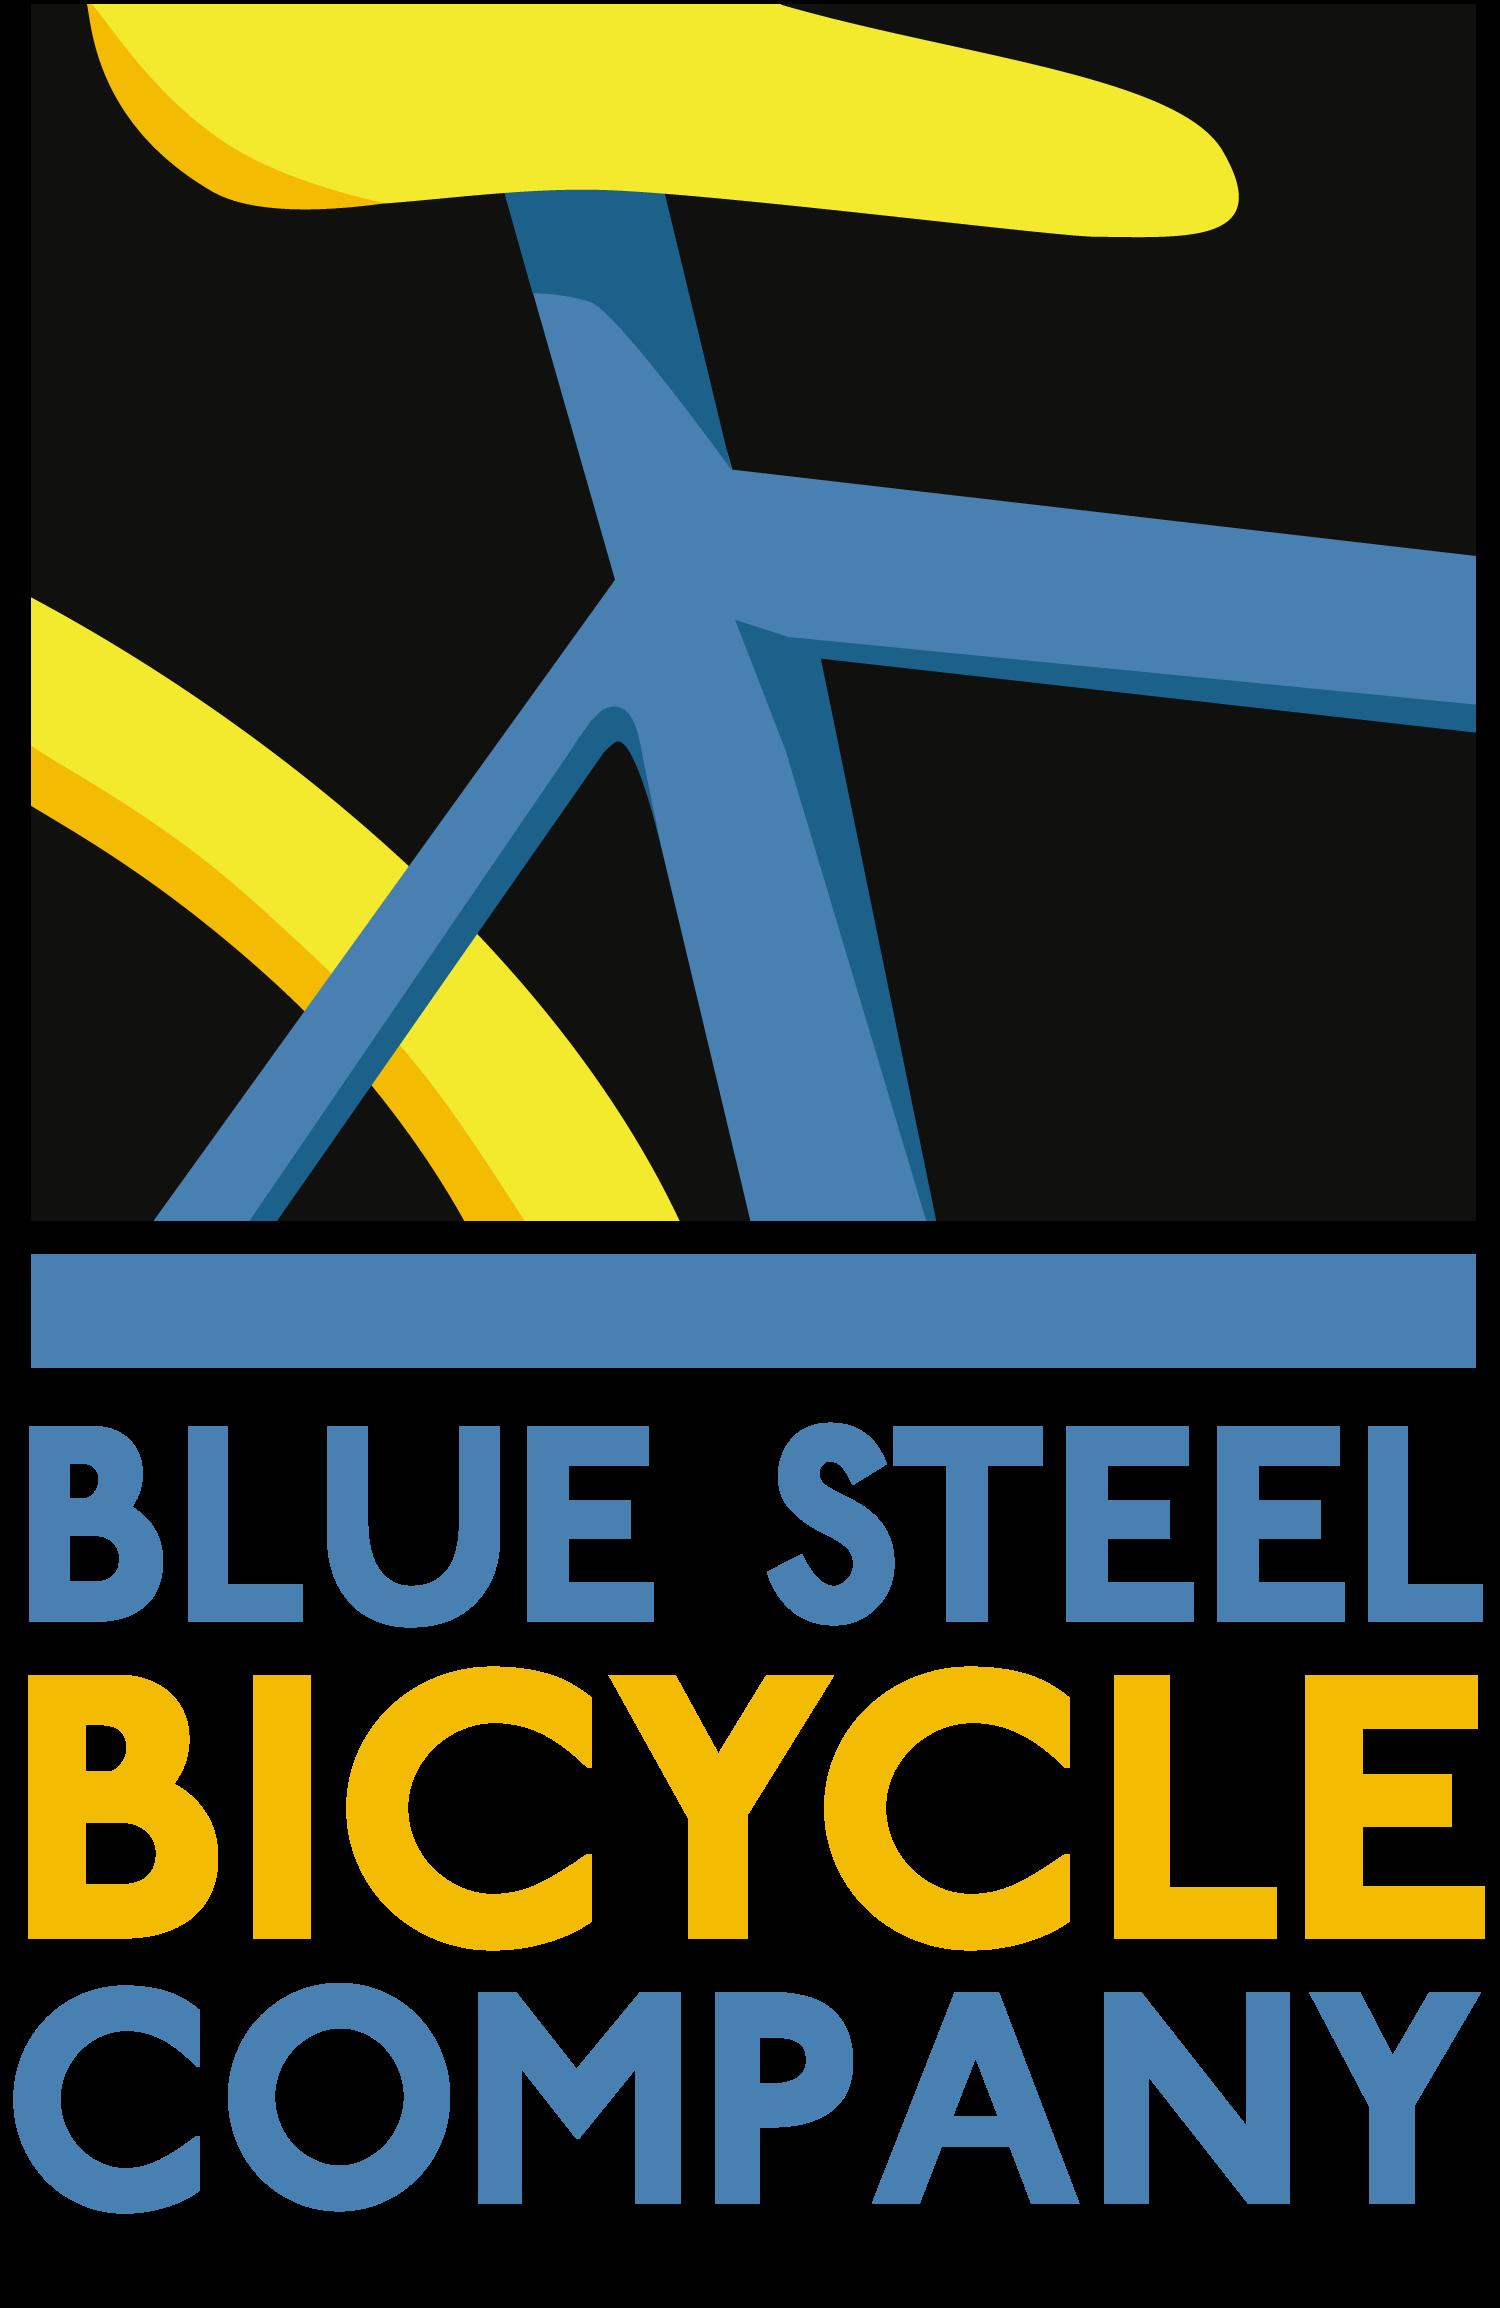 blue steel bicycle company logo